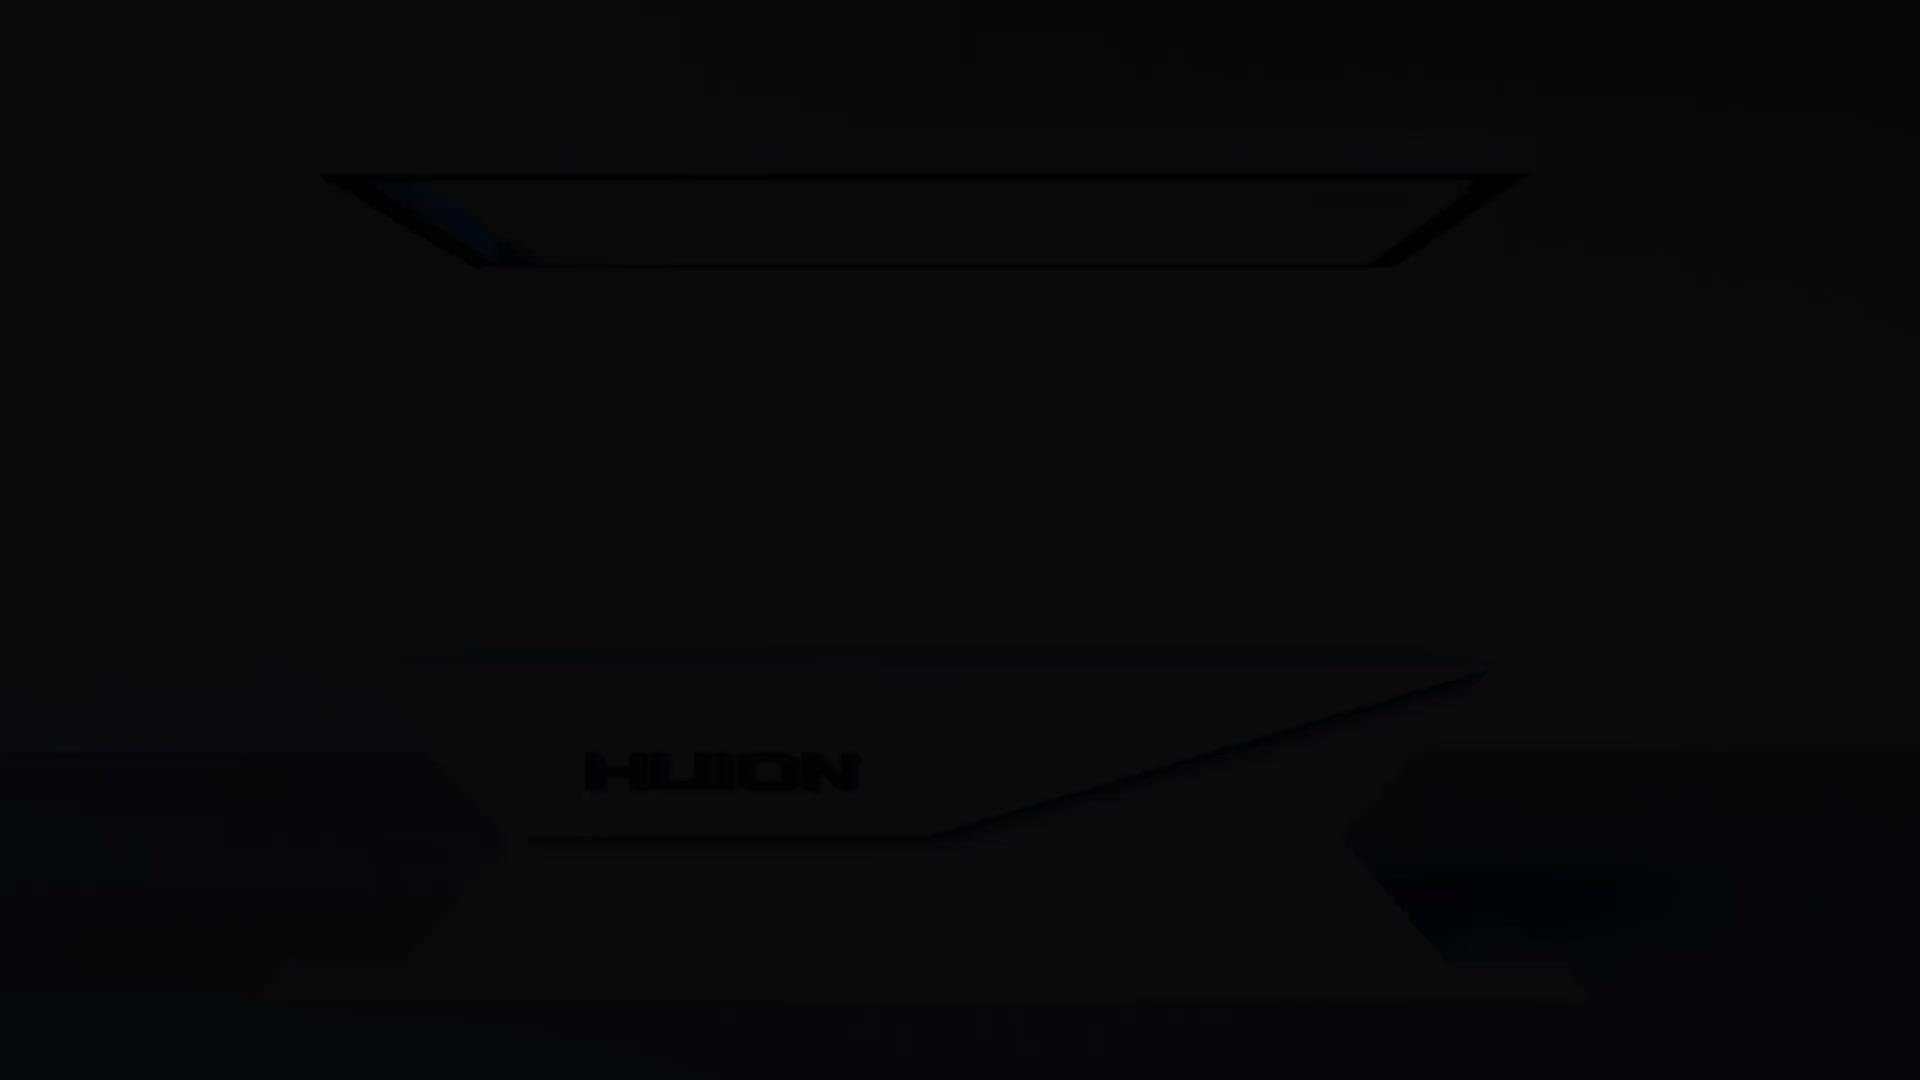 Latest Huion kamvas pro 16 premium full lamination portable computers laptop desktops type-c graphic drawing monitor